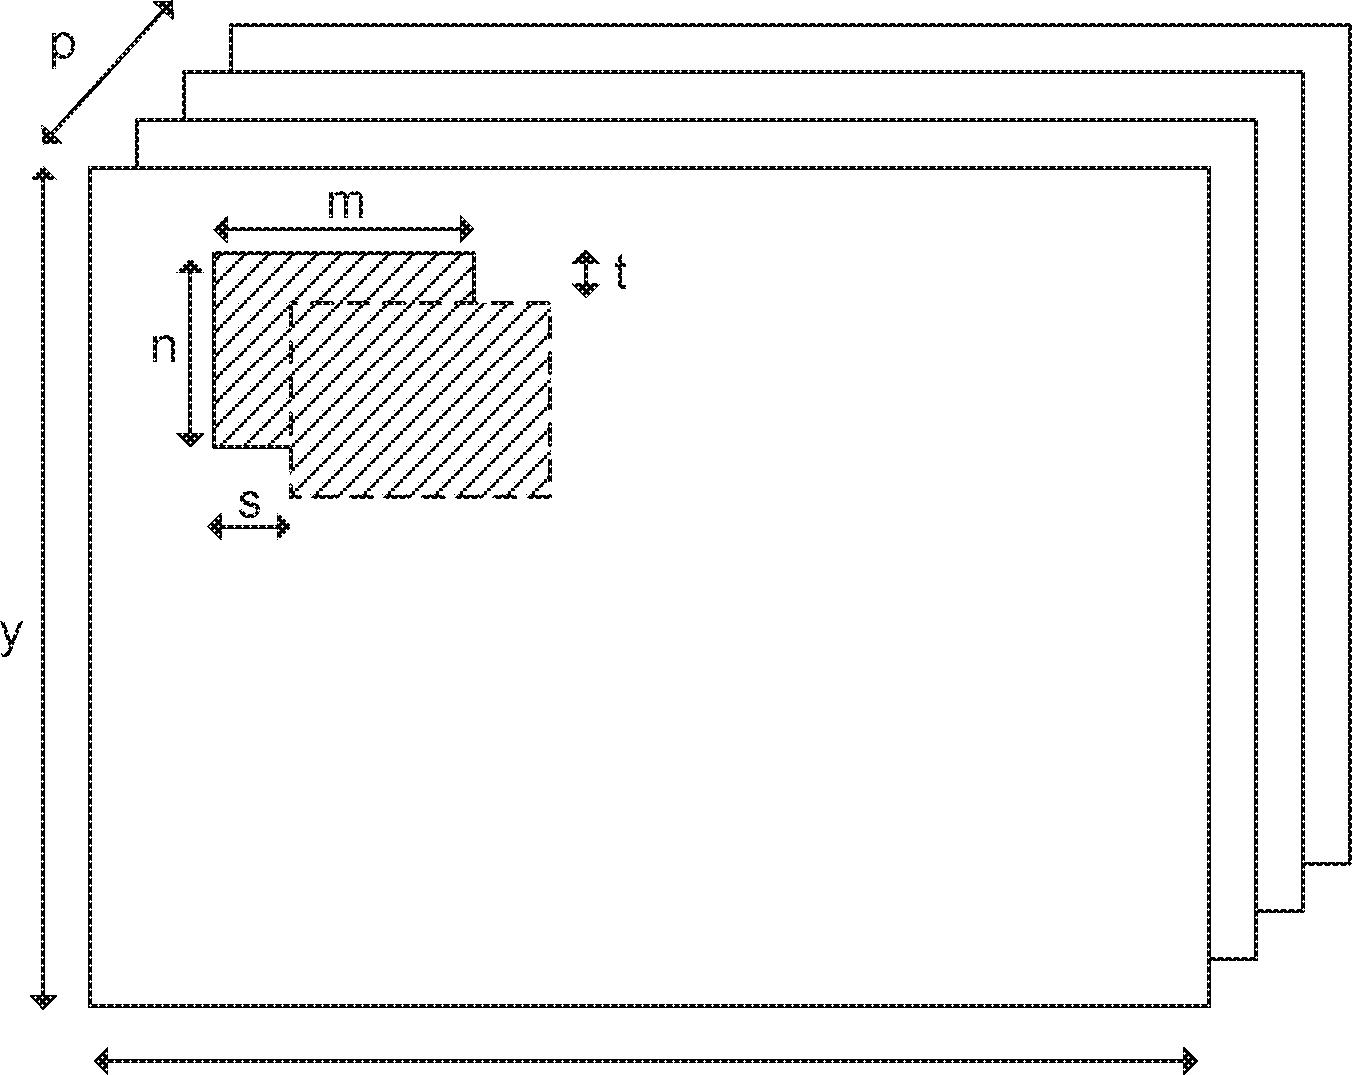 Figure GB2552242A_D0002